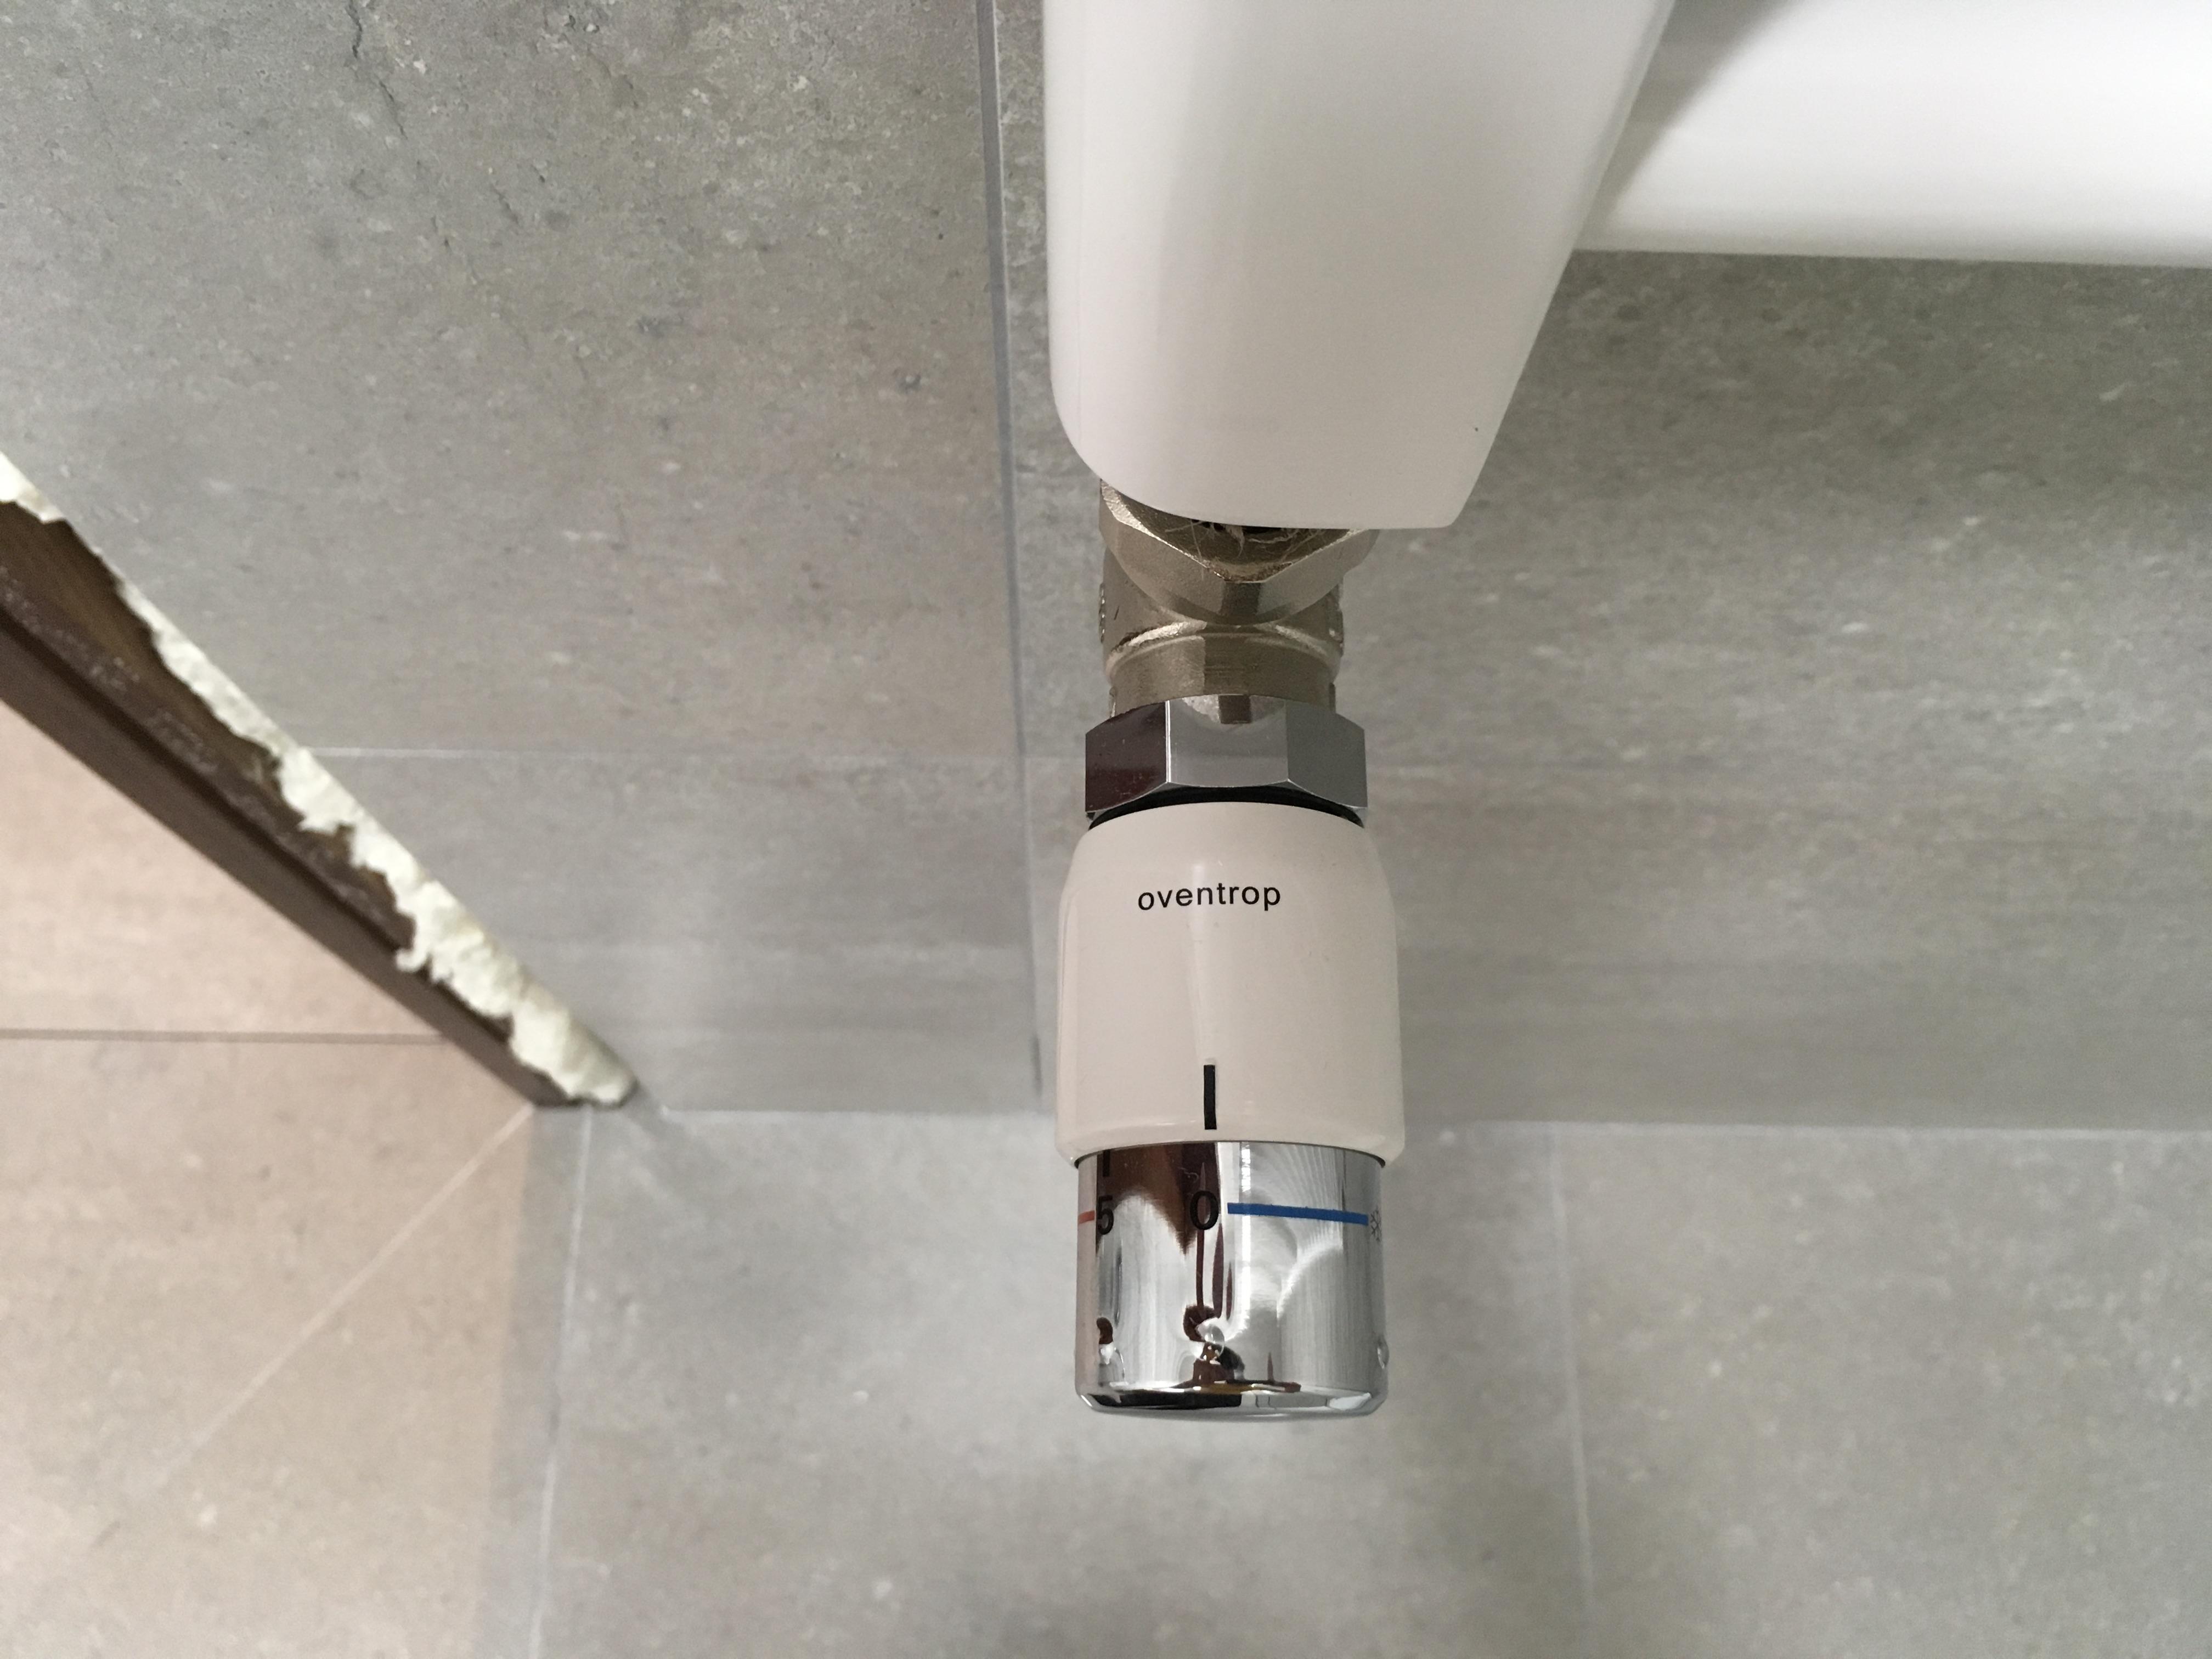 Сантехника под ключ в квартире - Systems Engineering - photo 12